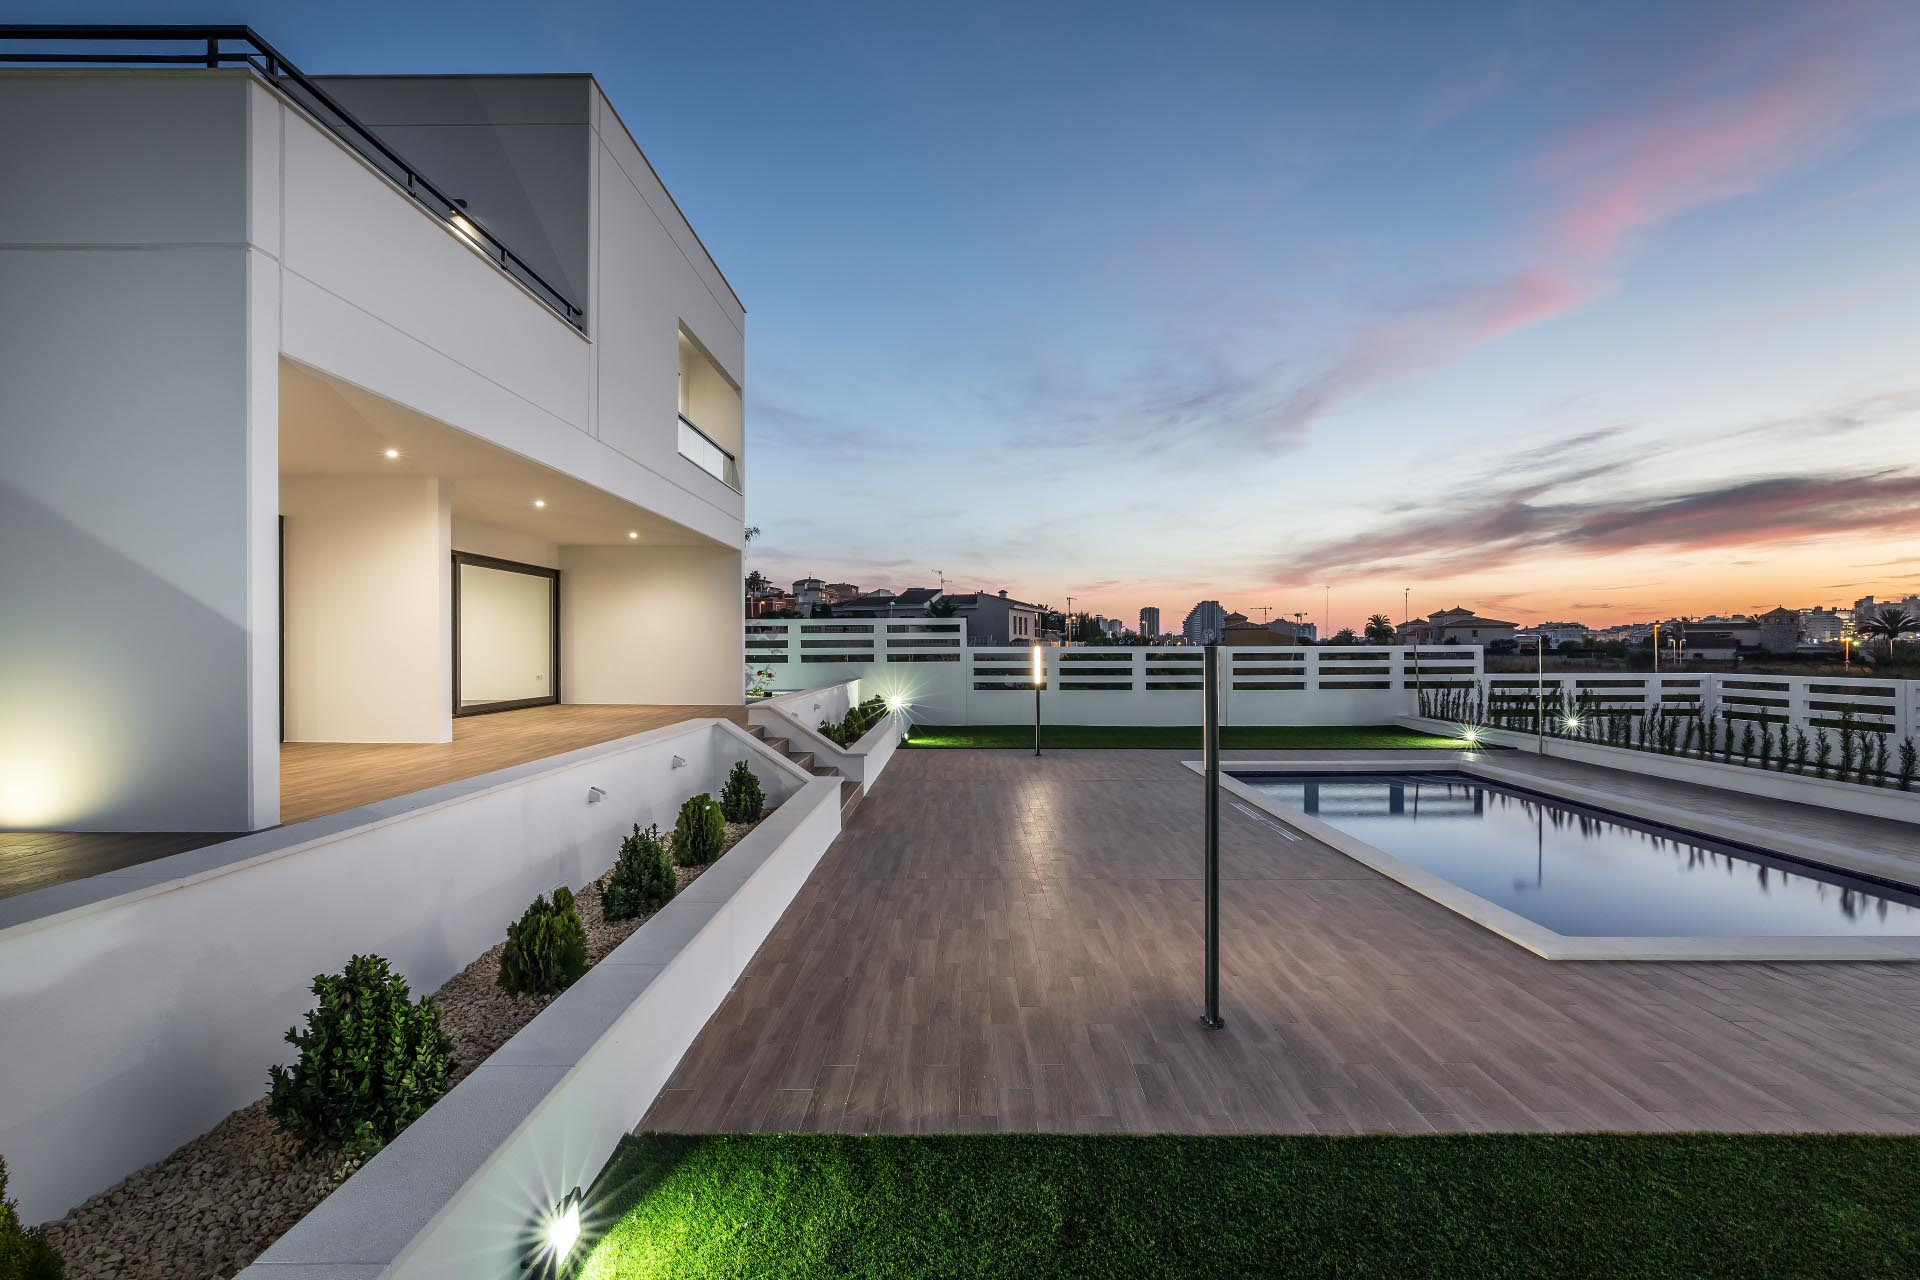 fotografia-arquitectura-valencia-german-cabo-viraje-vivienda-unifamiliar-calpe (x)_portada_02